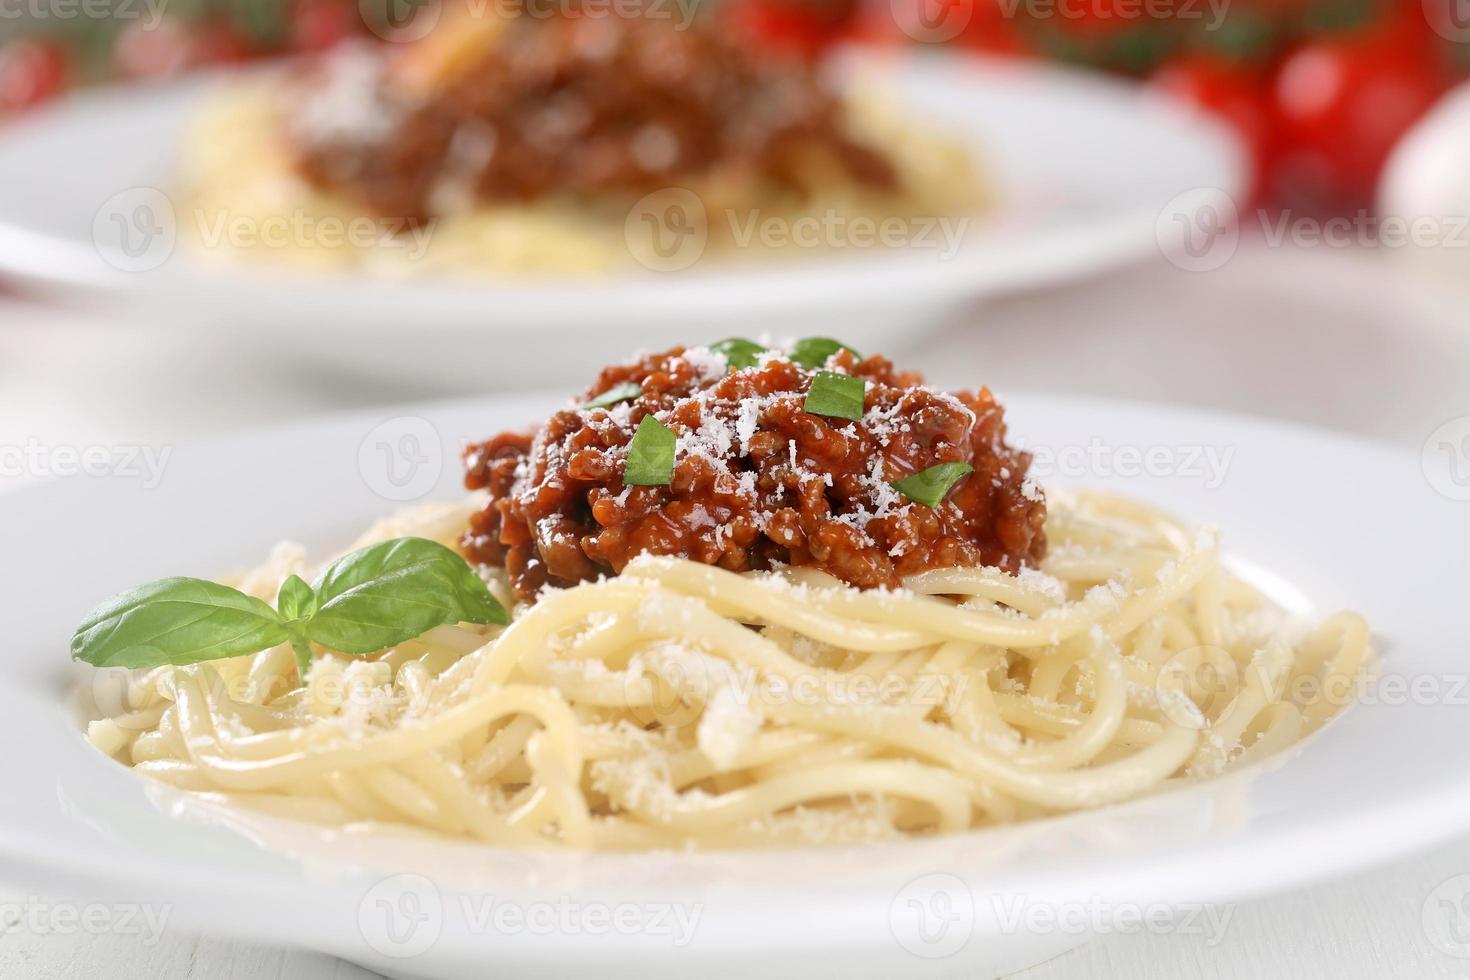 Spaghetti Bolognese Nudeln Pasta Mahlzeit auf einem Teller foto